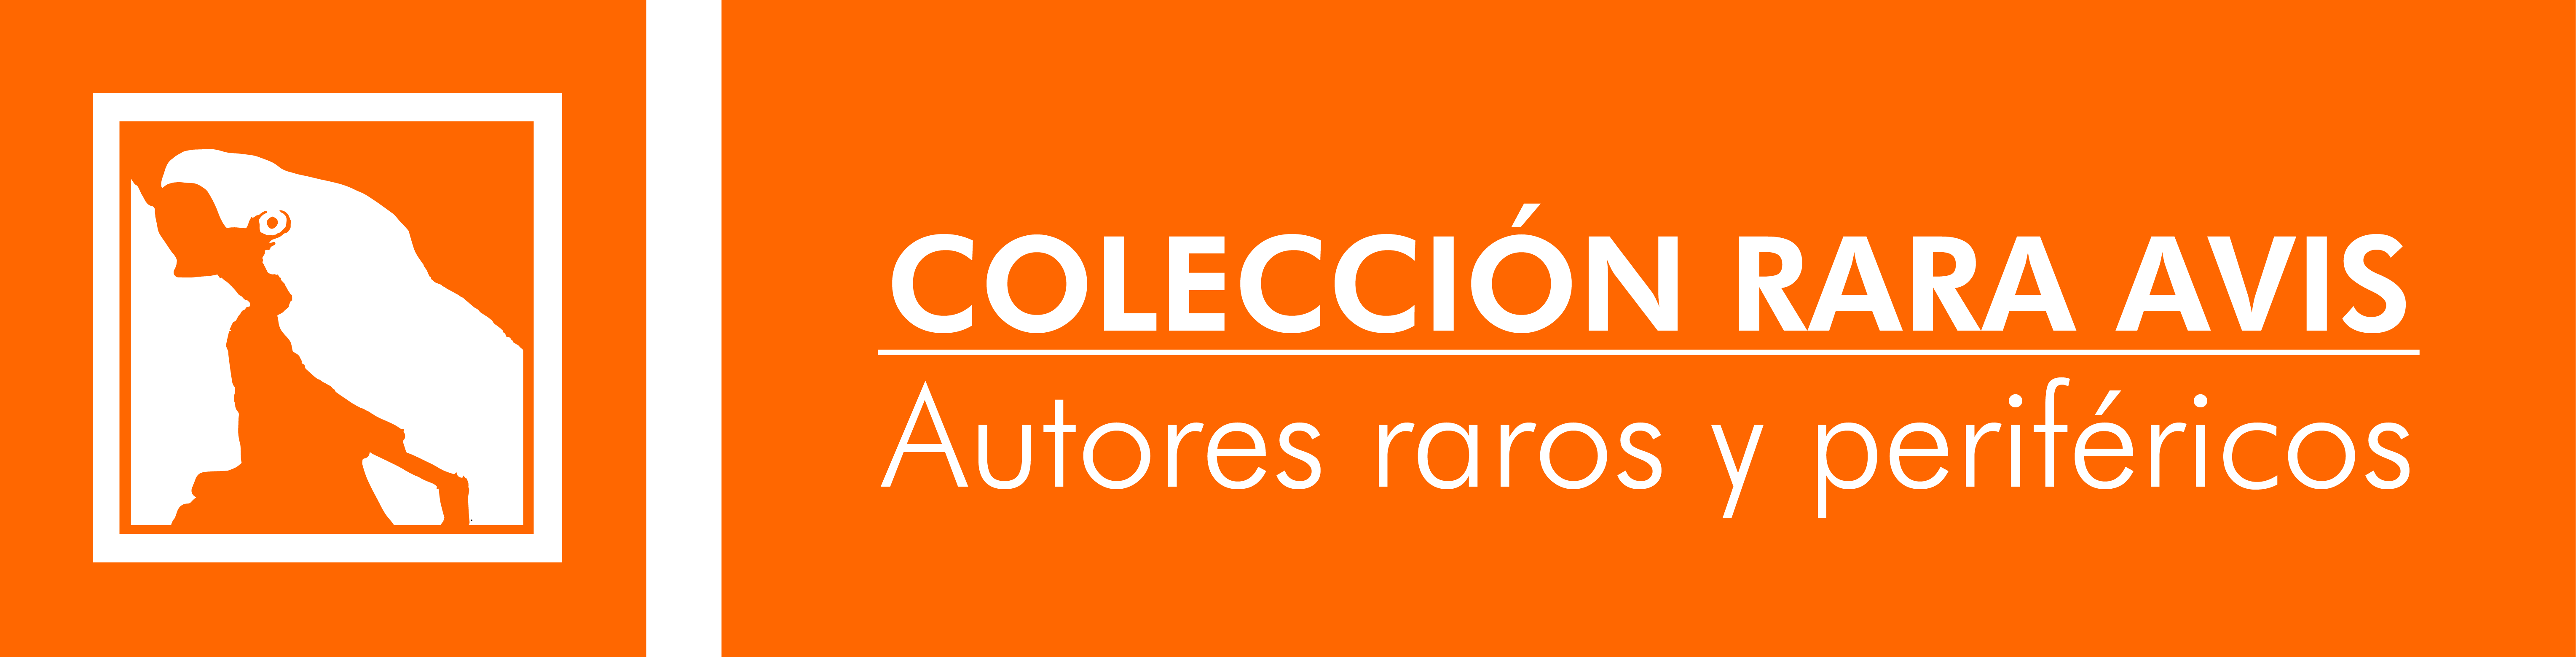 CC-14